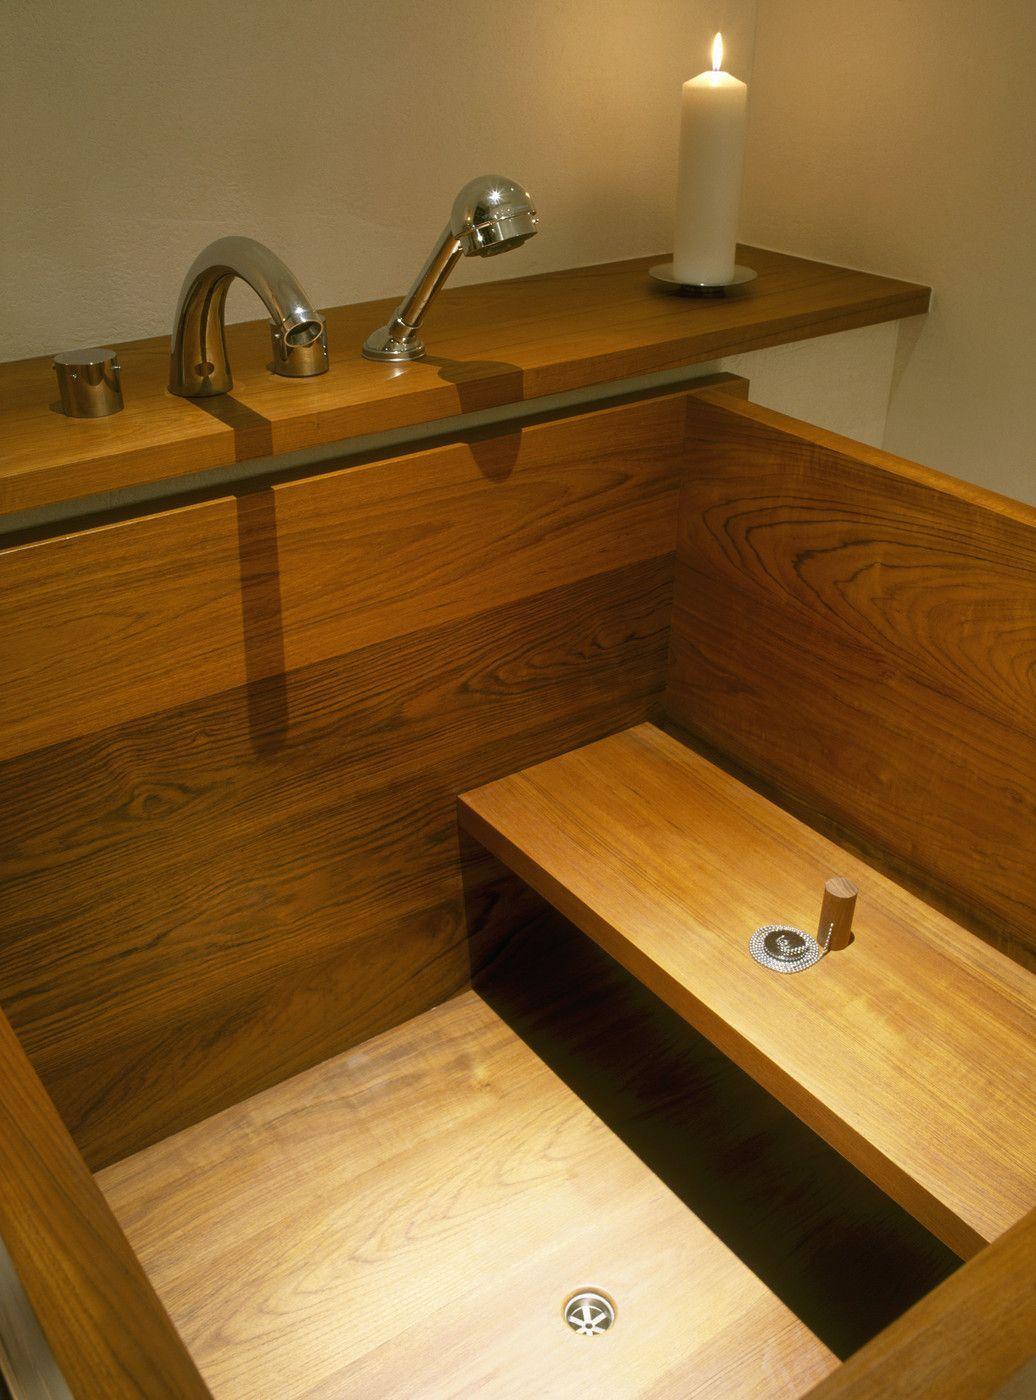 Bathroom Photos: Interesting wood (teak?) take on a Japanese soaking ...